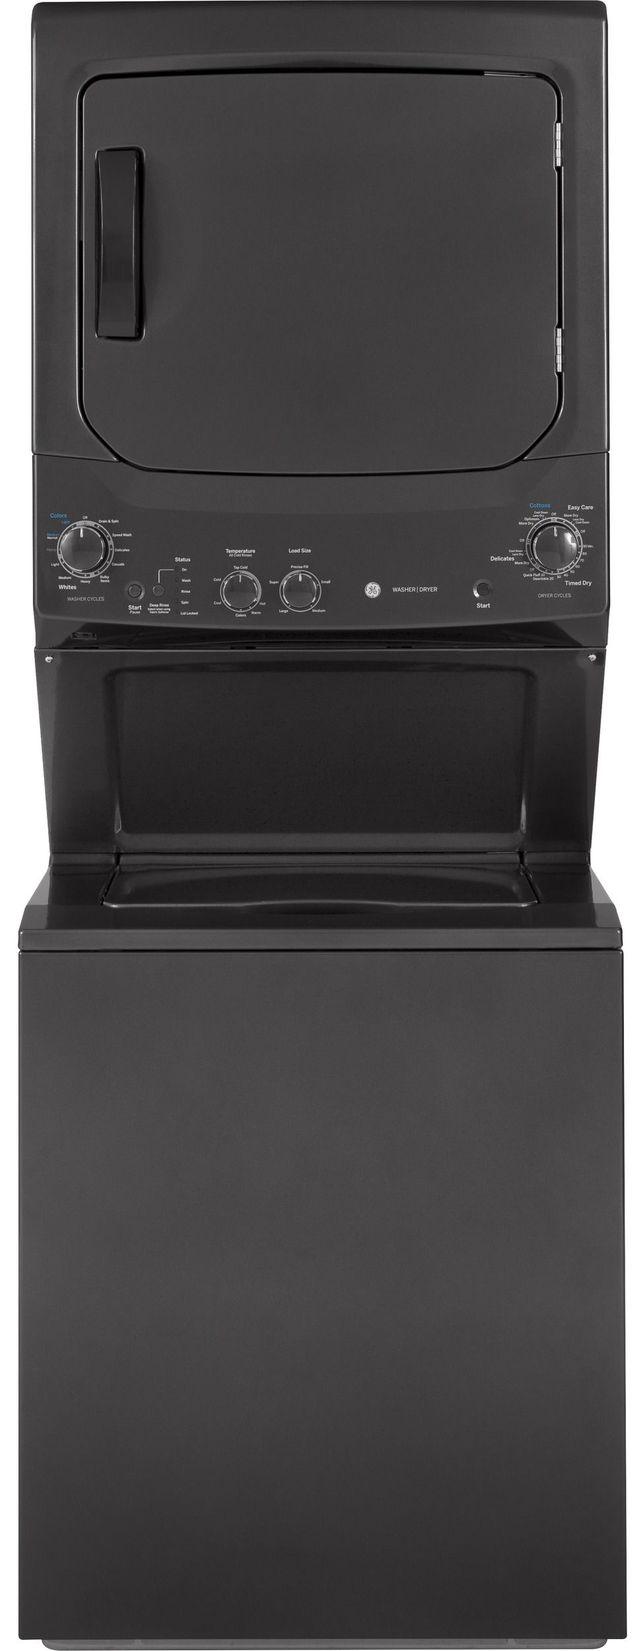 GE® Unitized Spacemaker® Stack Laundry-Diamond Gray-GUD27ESPMDG